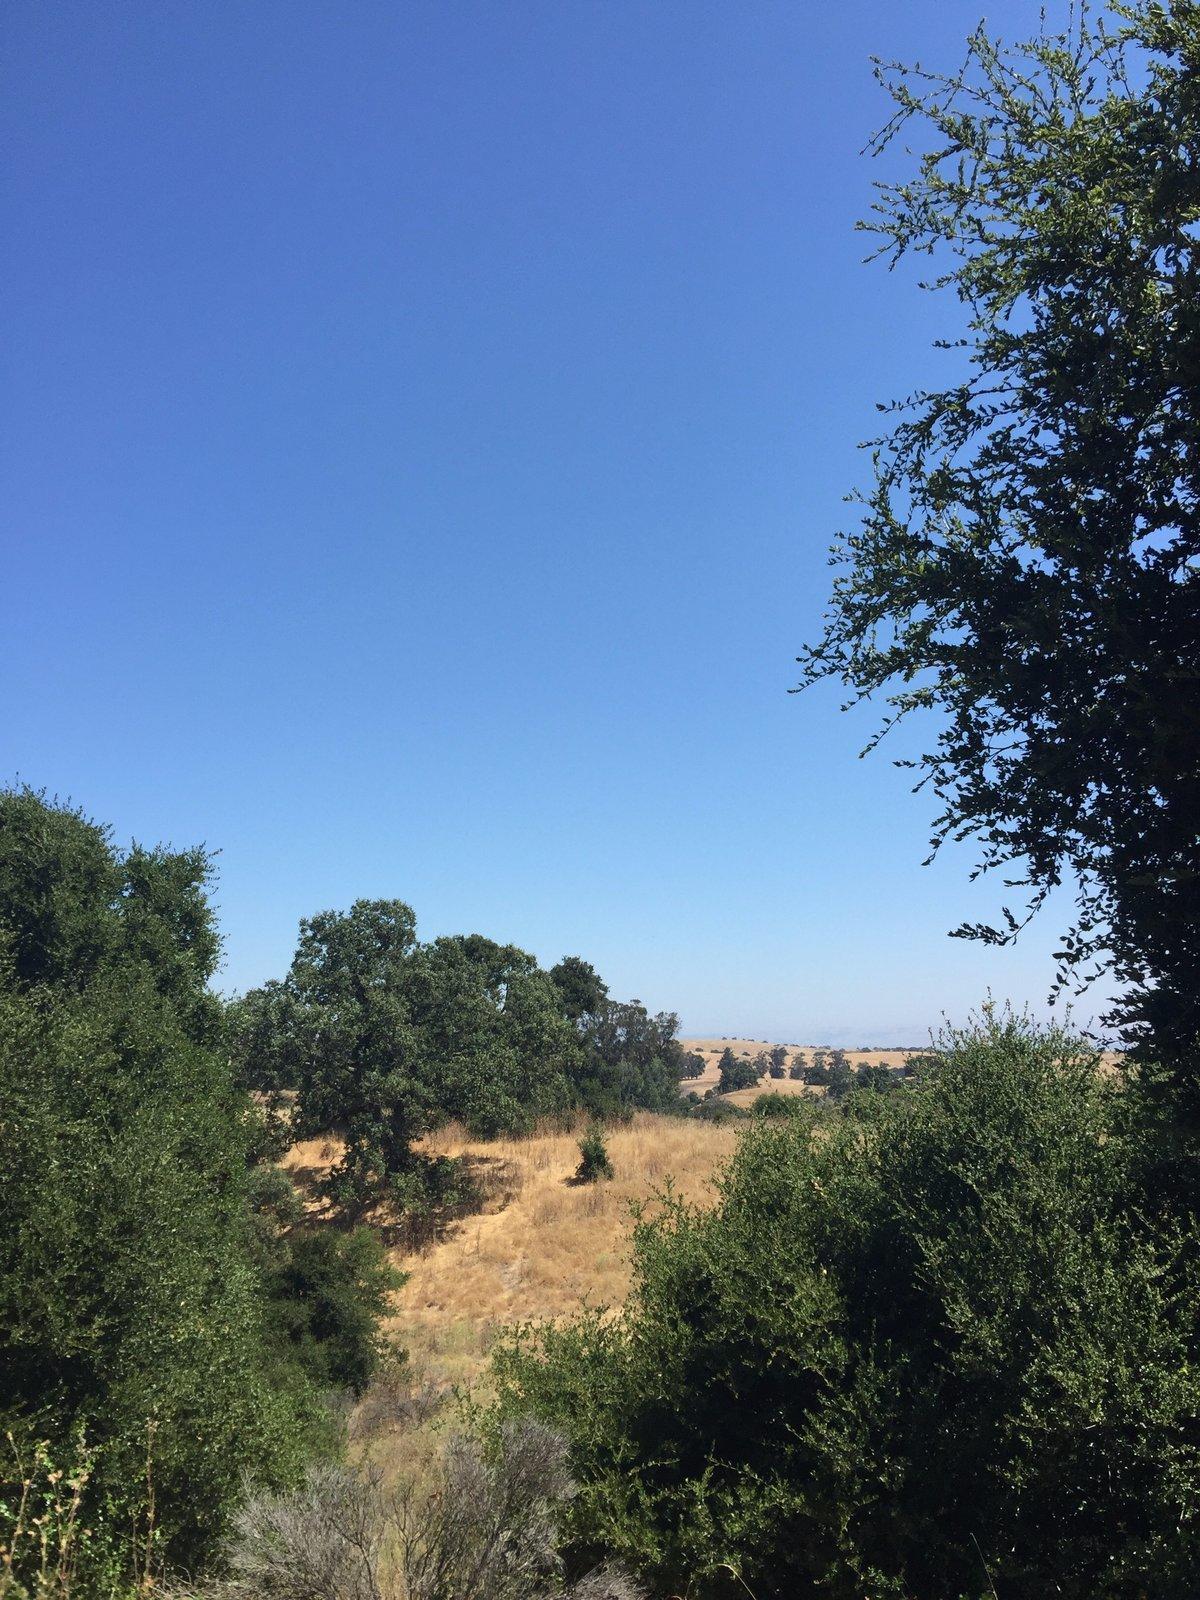 Oaks and grassy hills.  Photo 4 of 7 in Arastradero Preserve